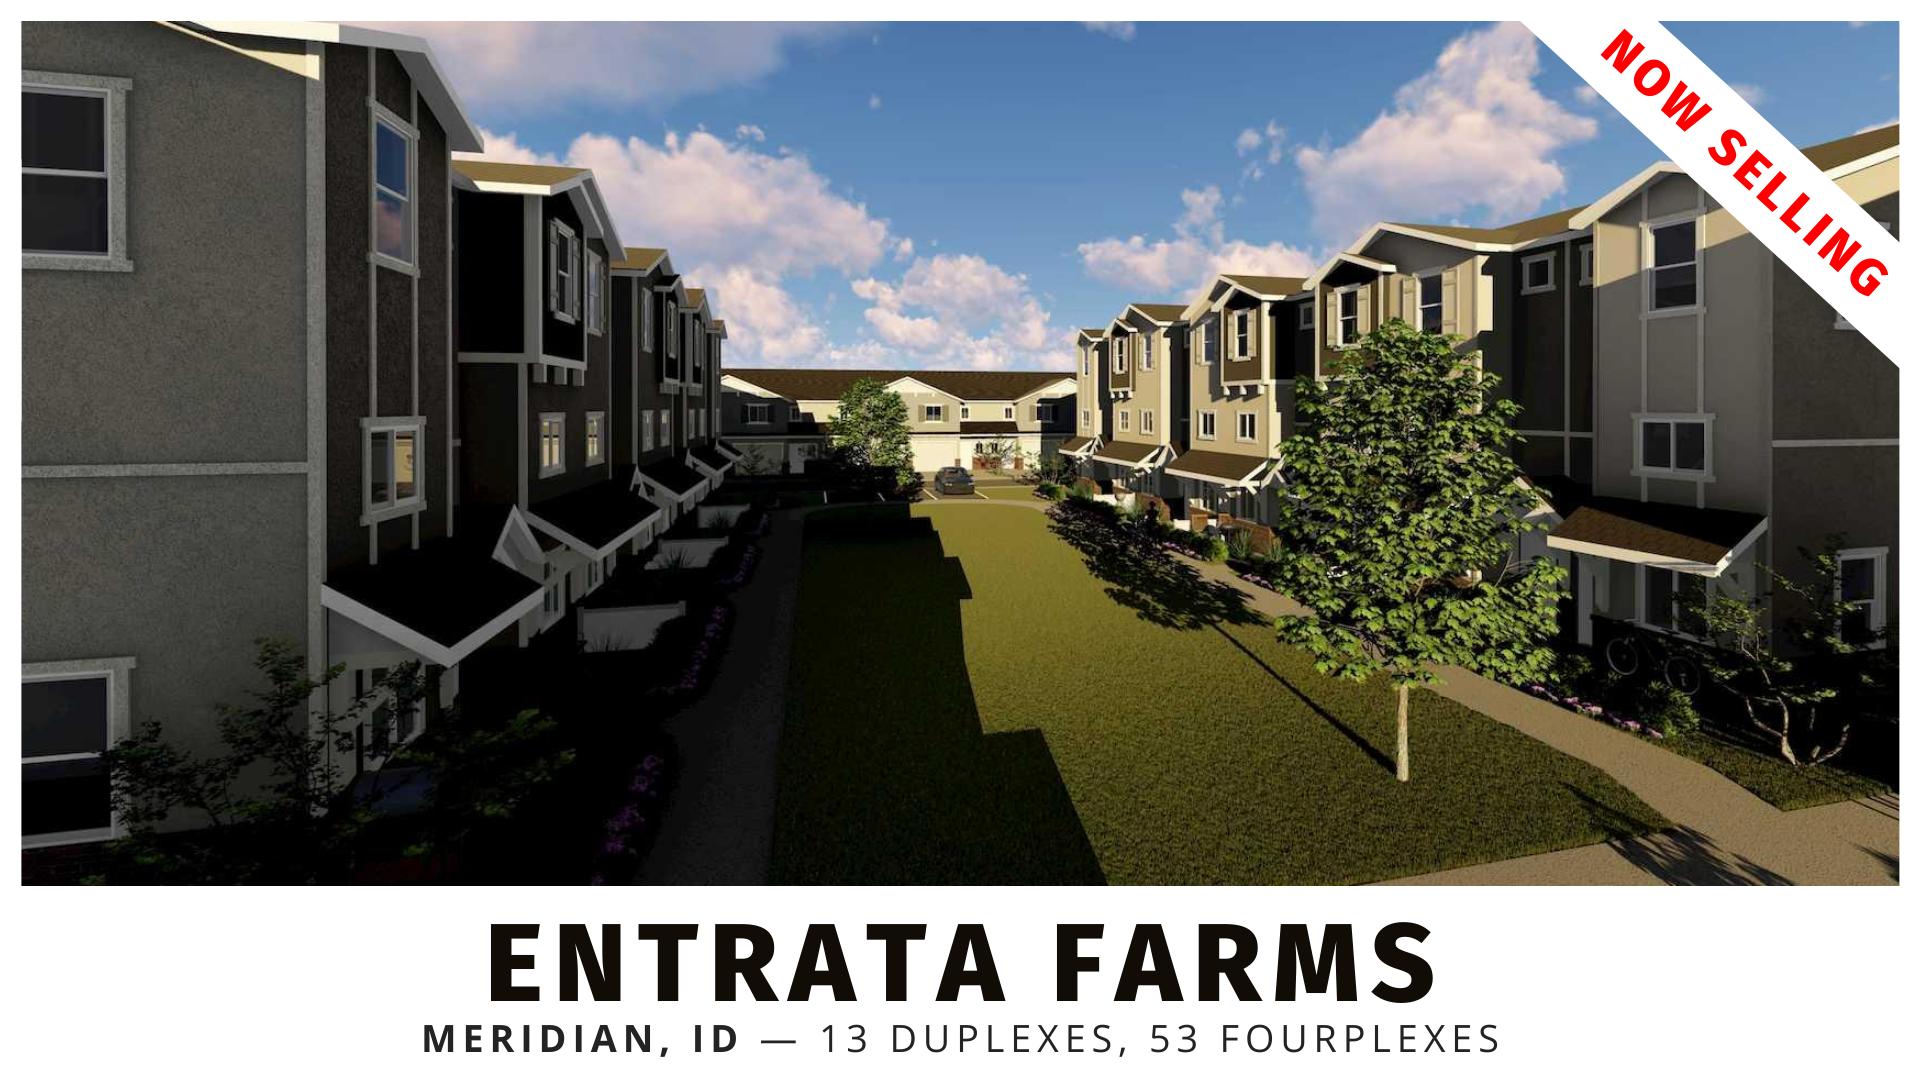 Entrata Farms duplexes and fourplexes for sale in Meridian, Idaho